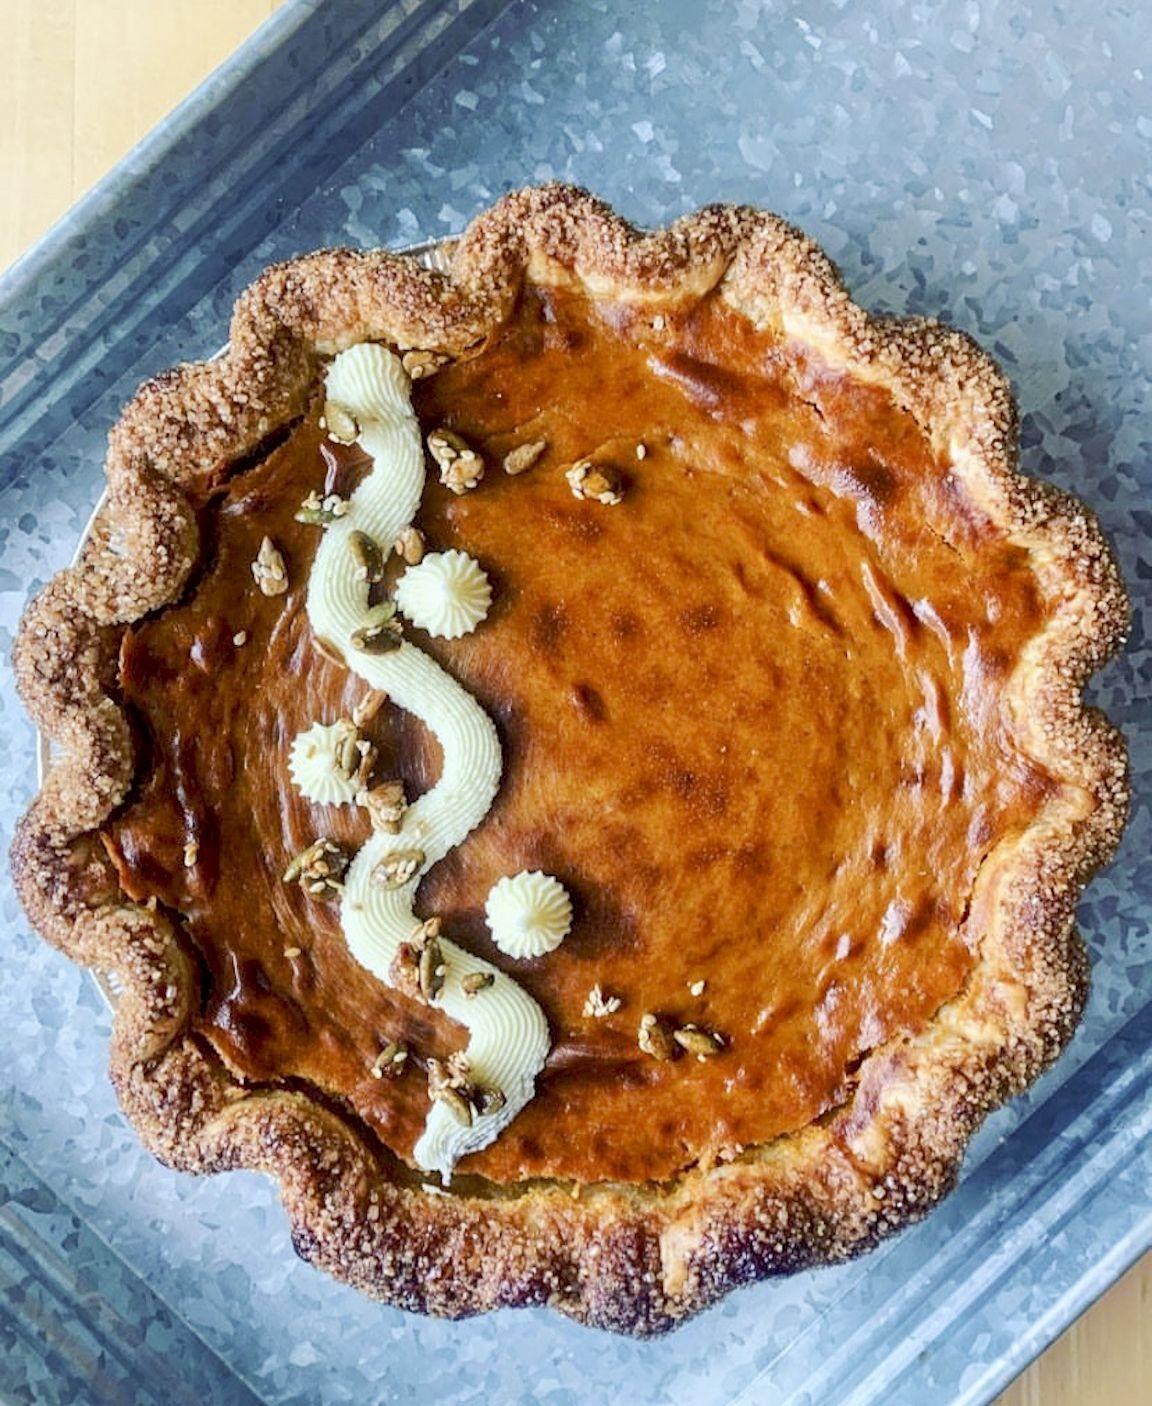 The pumpkin pie from Auspicious Baking Company